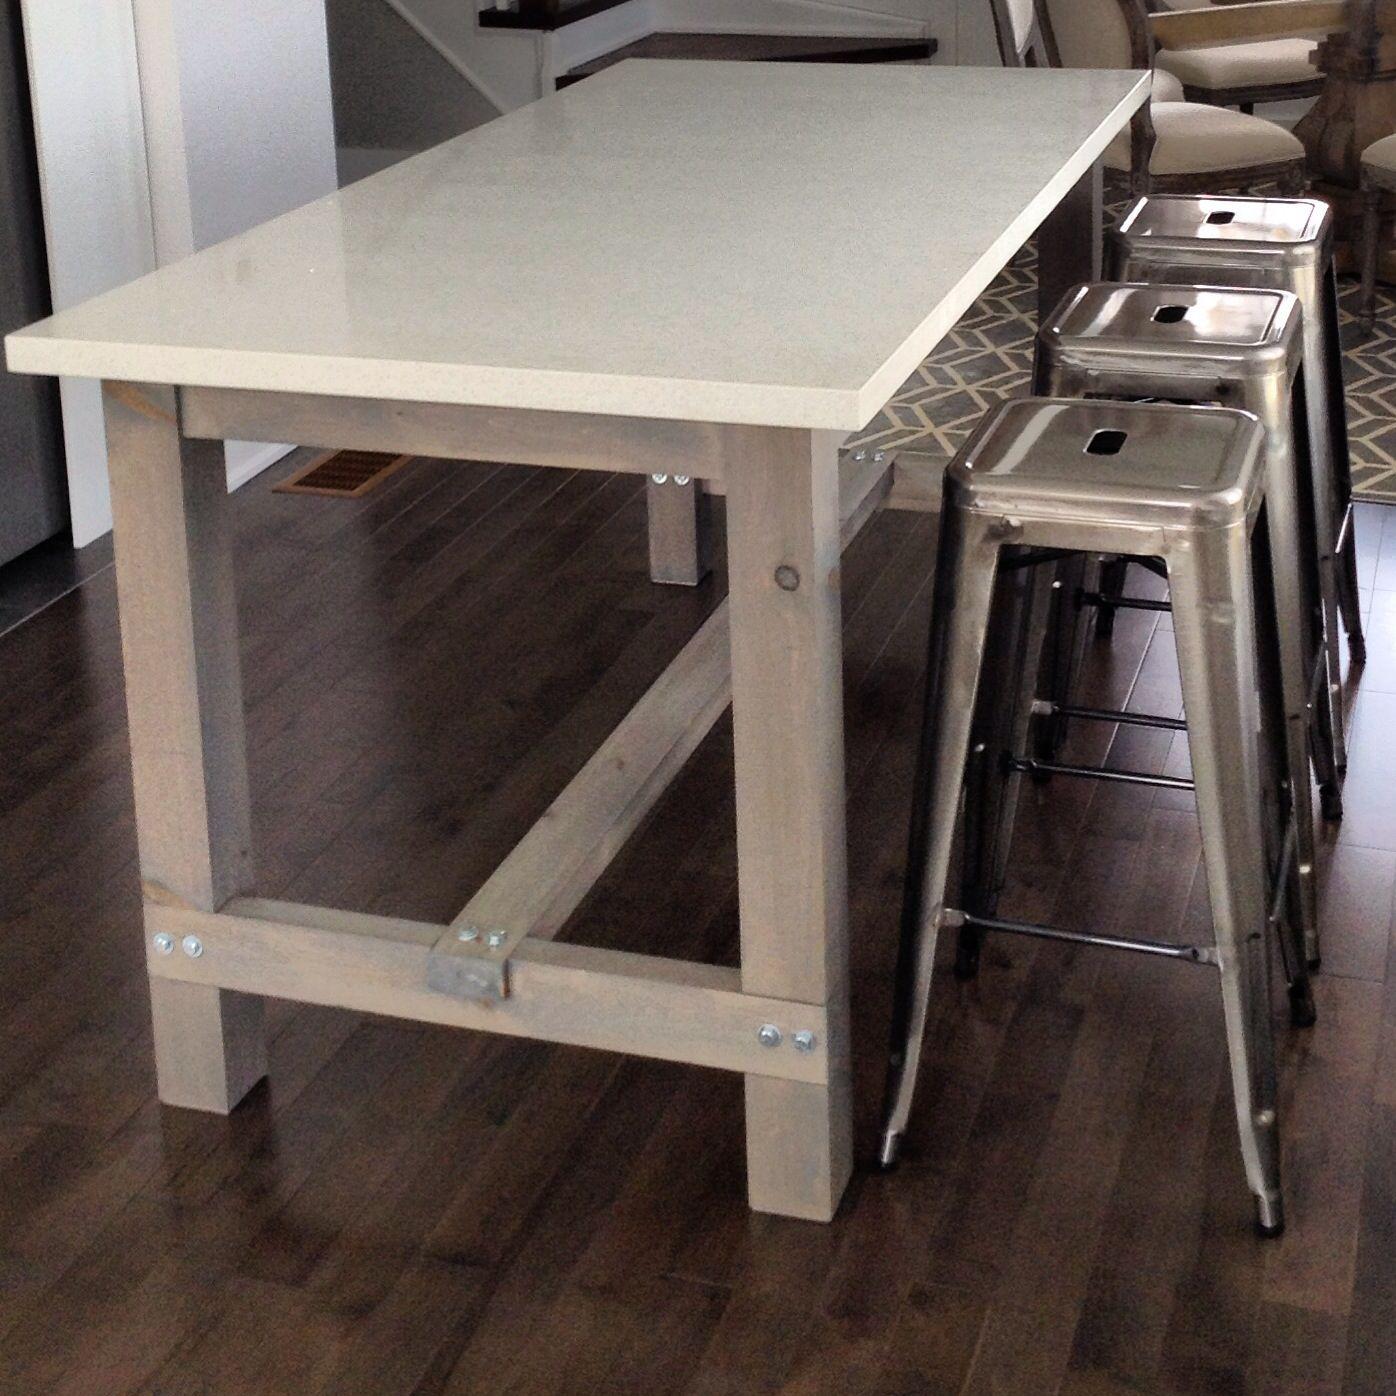 diy kitchen tables braun appliances harvest table island with white quartz counter